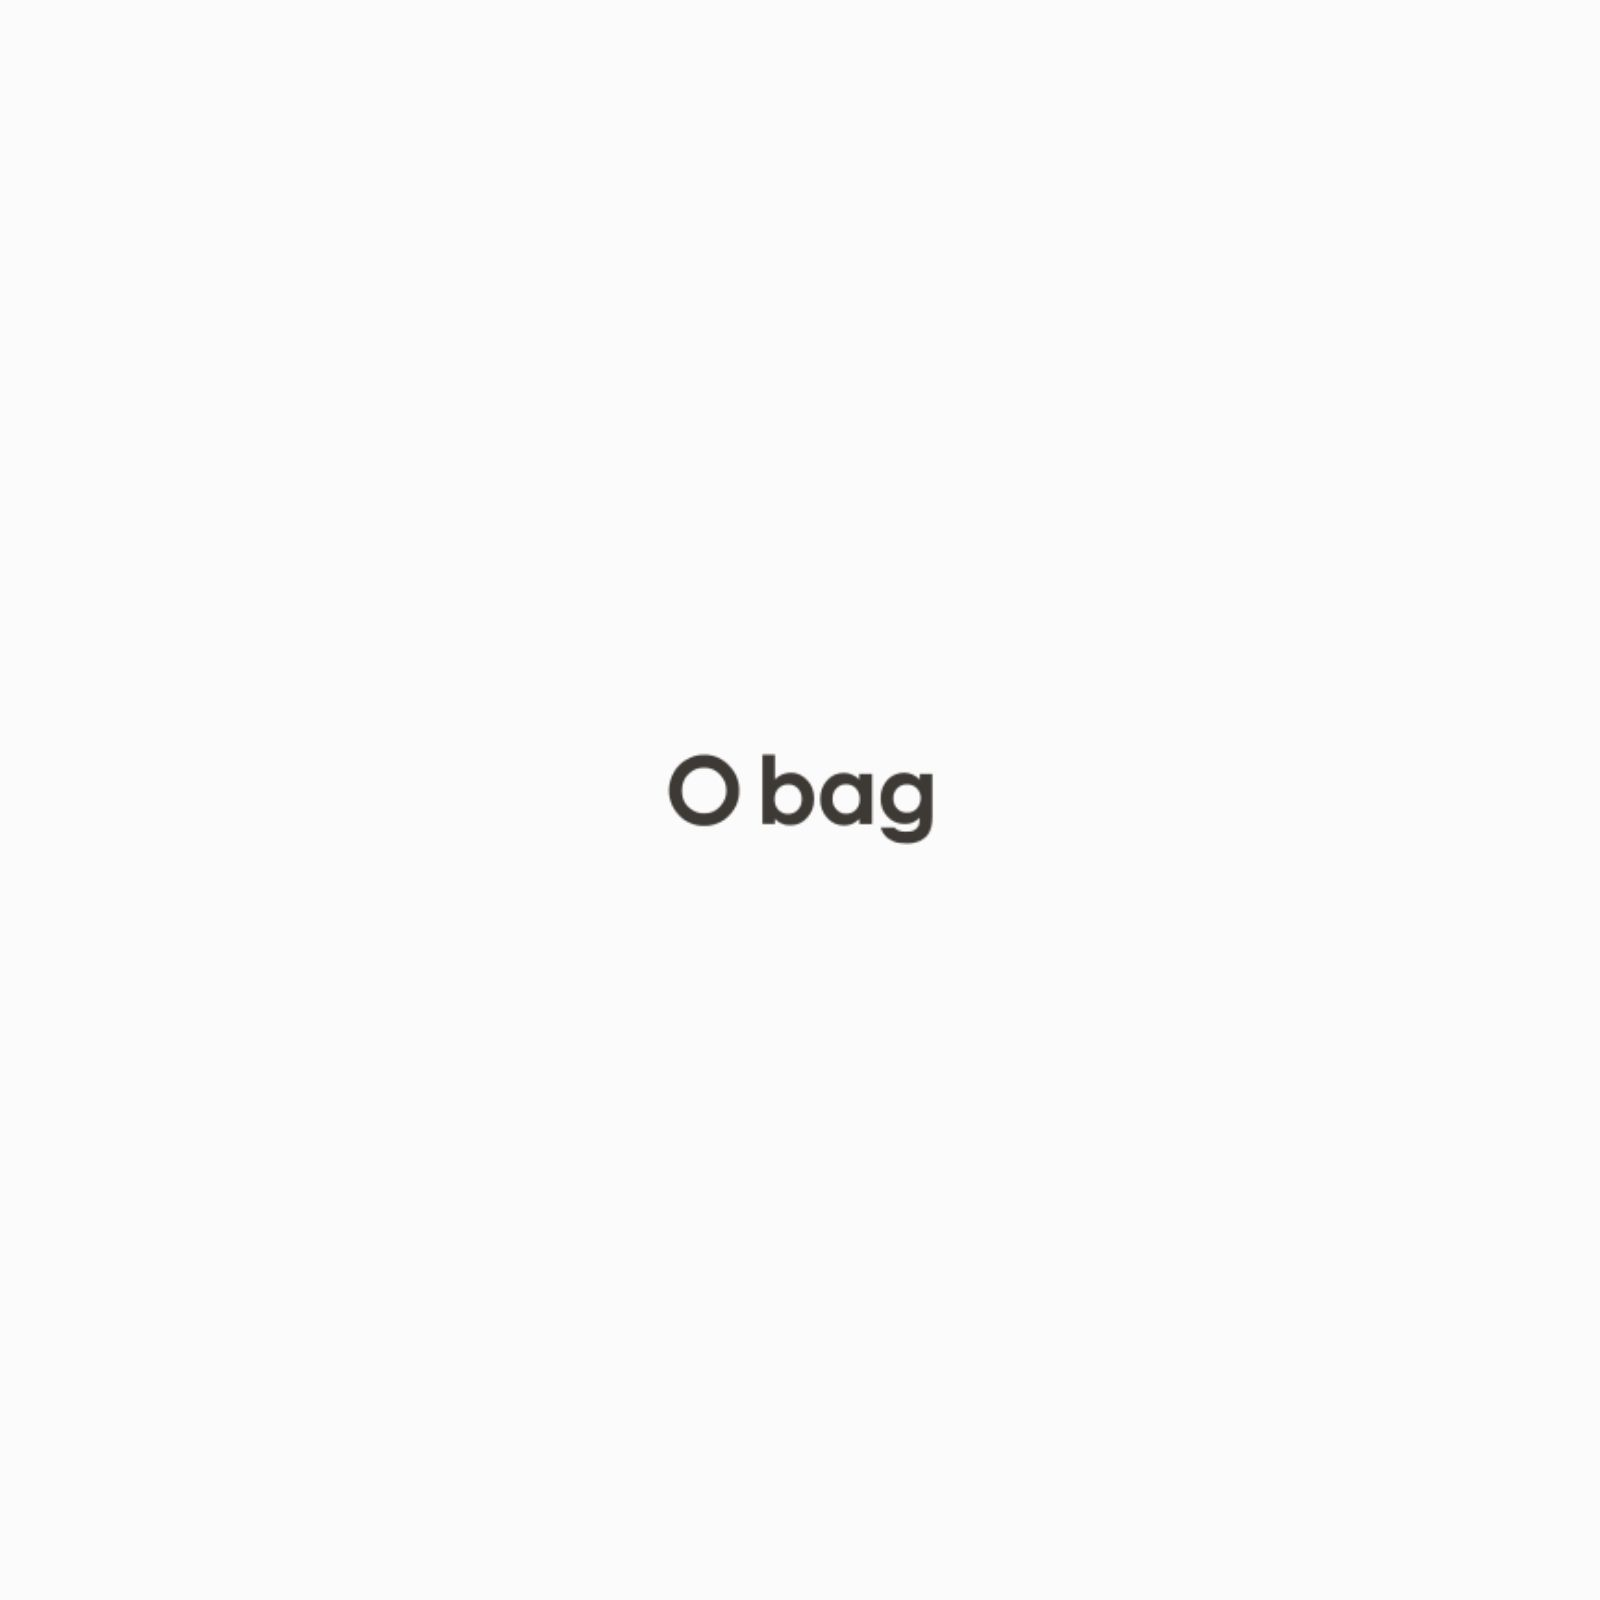 547d0ad843af O bag O bag - .包